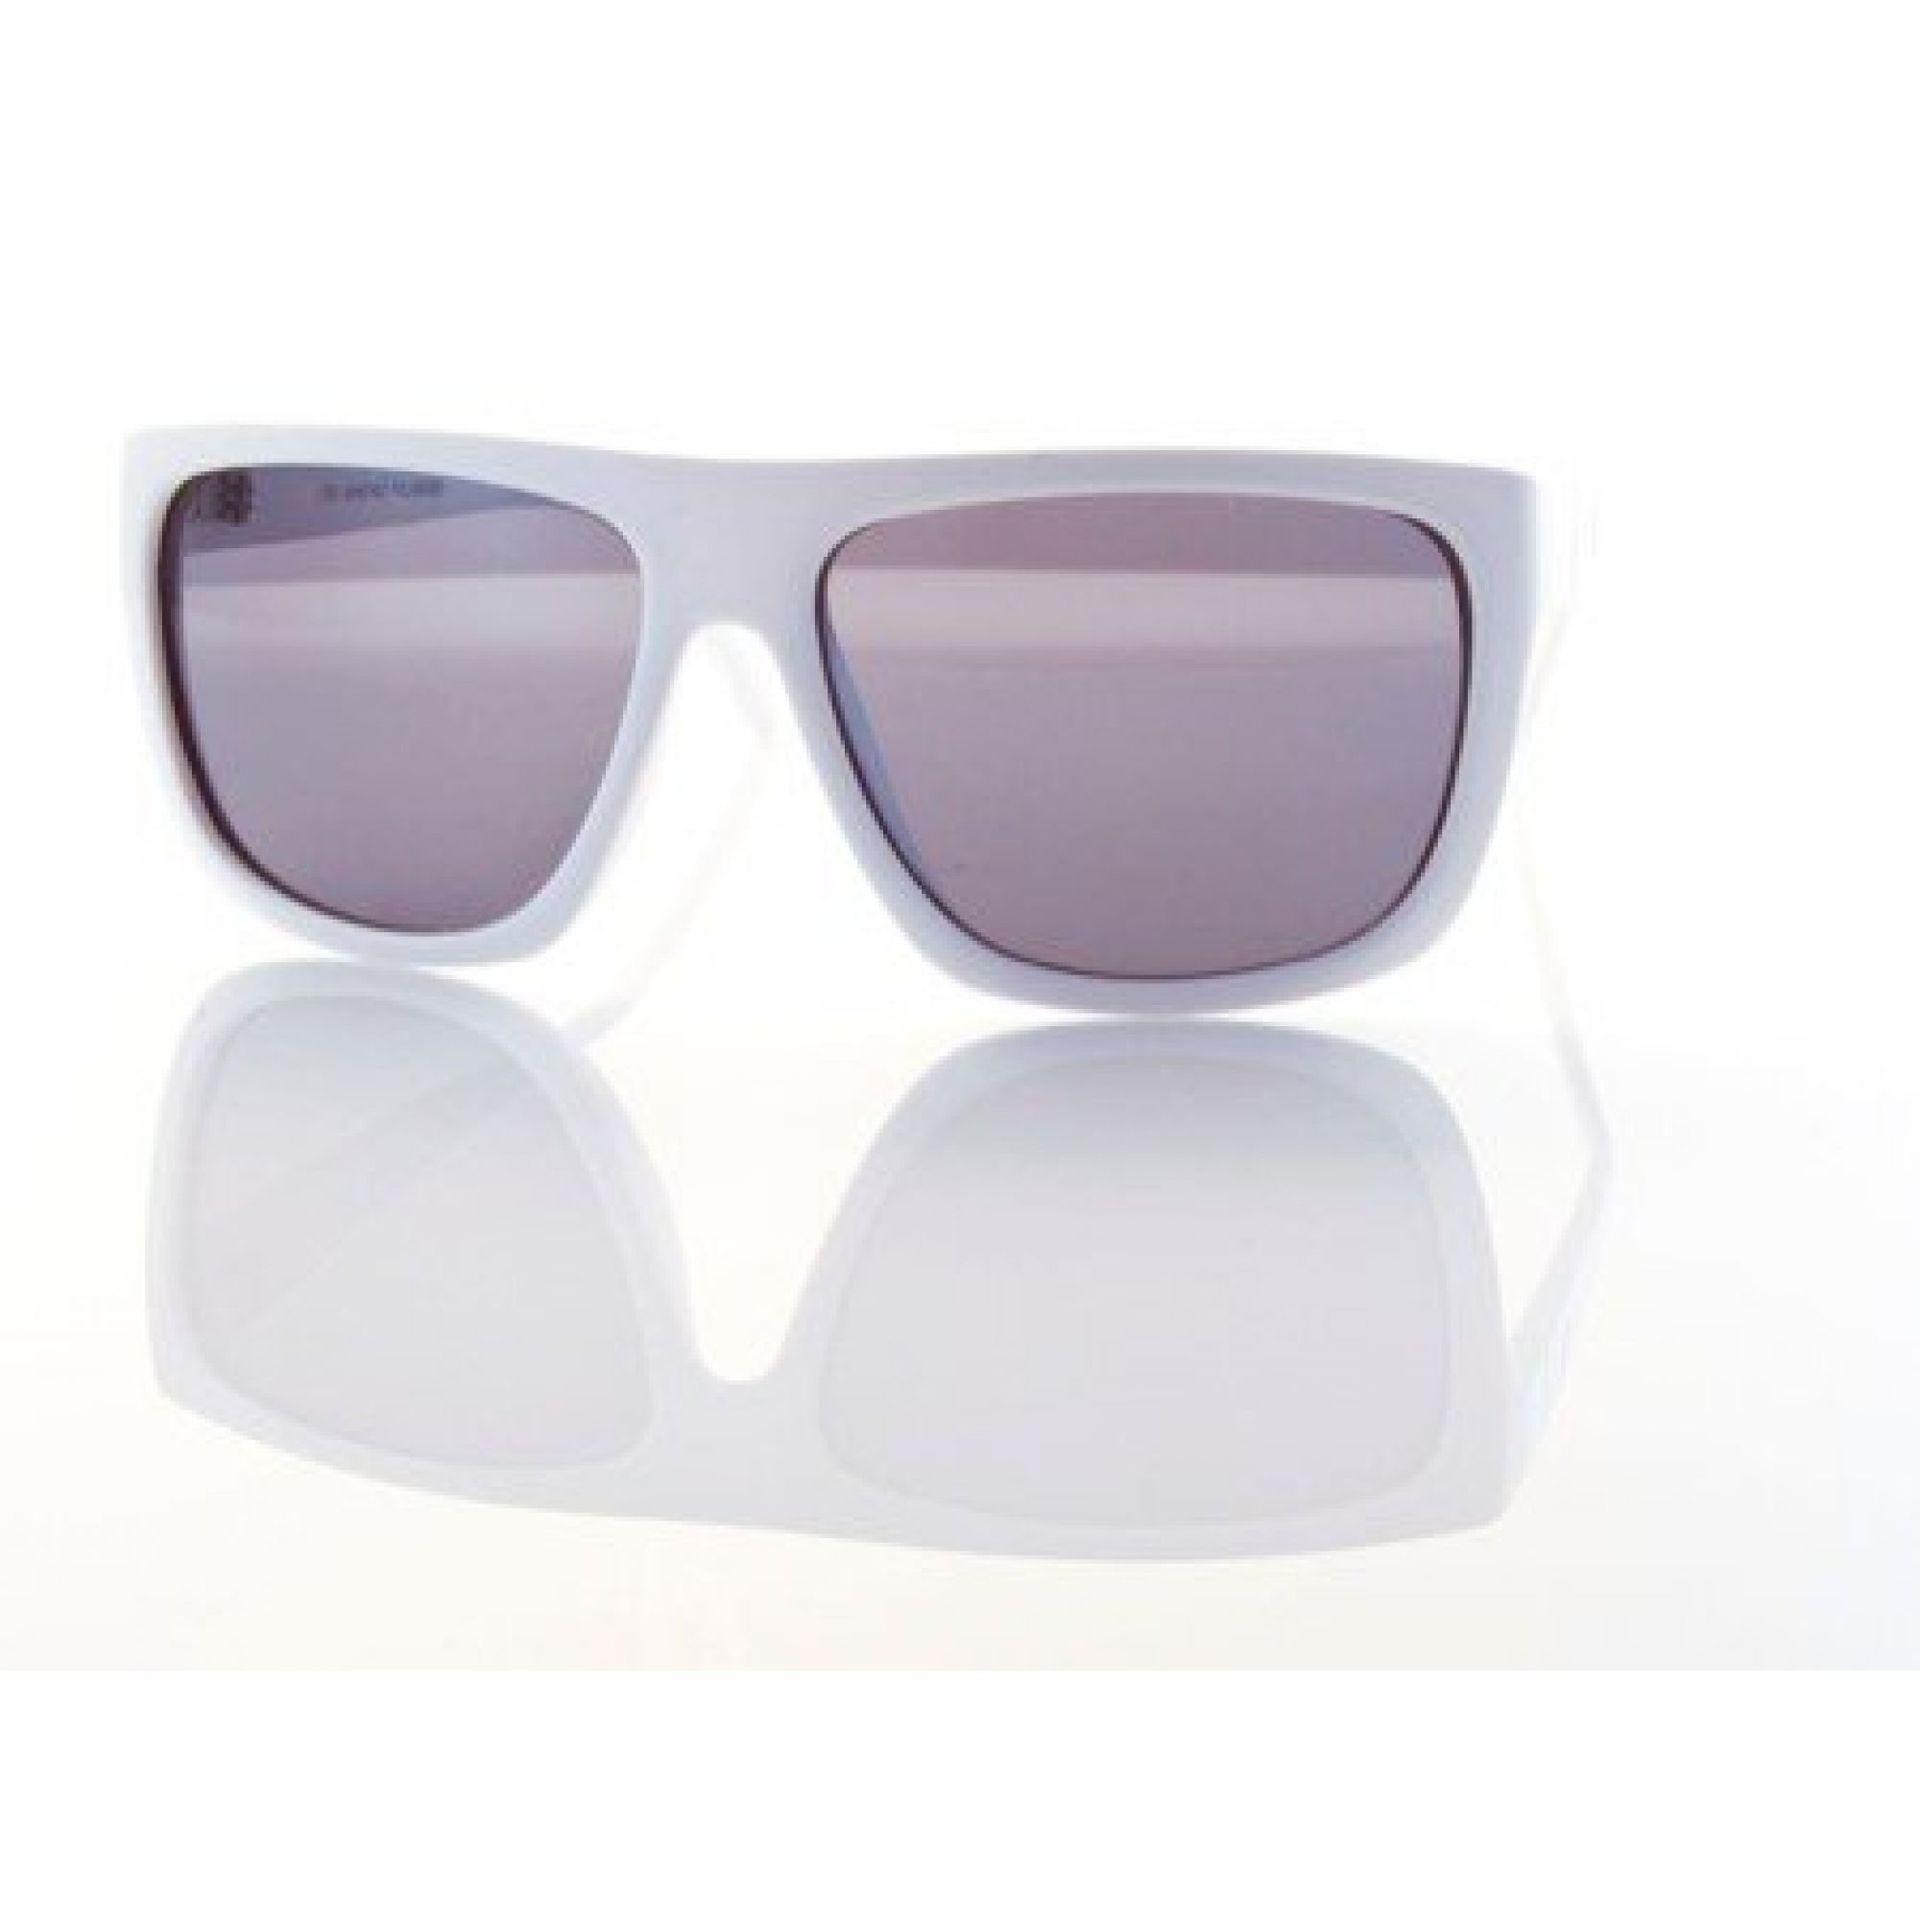 Okulary Carve Sanchez białe